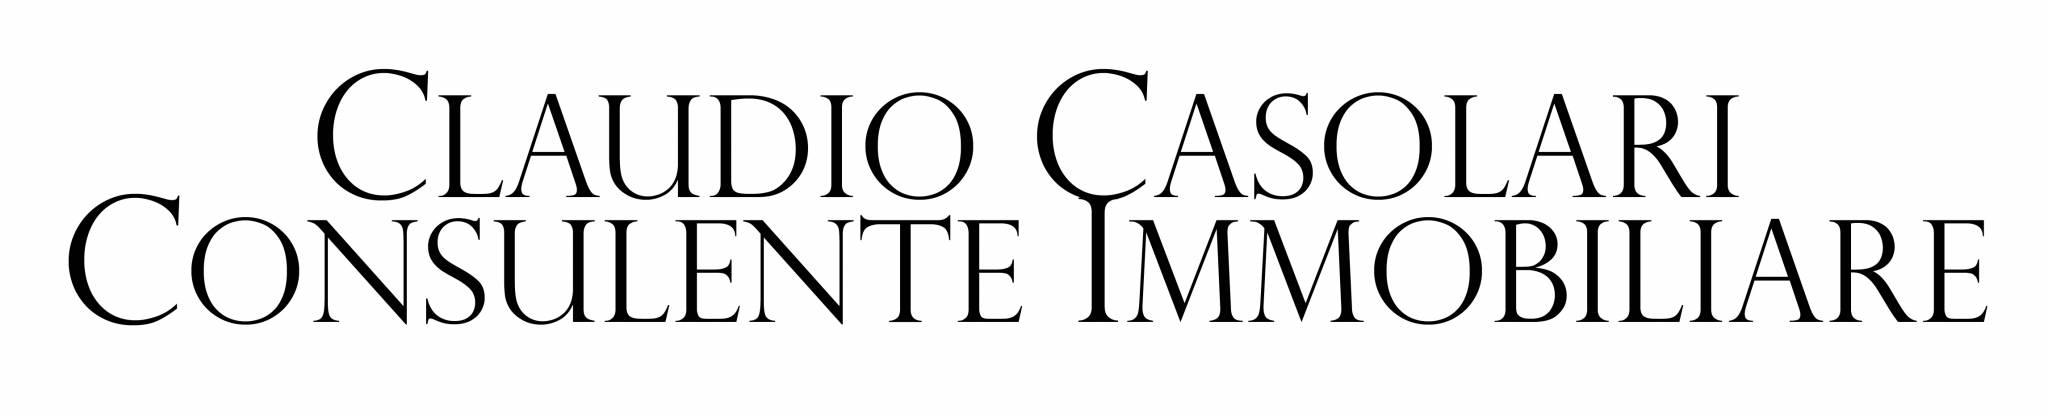 CCCI Claudio Casolari Consulente Immobiliare